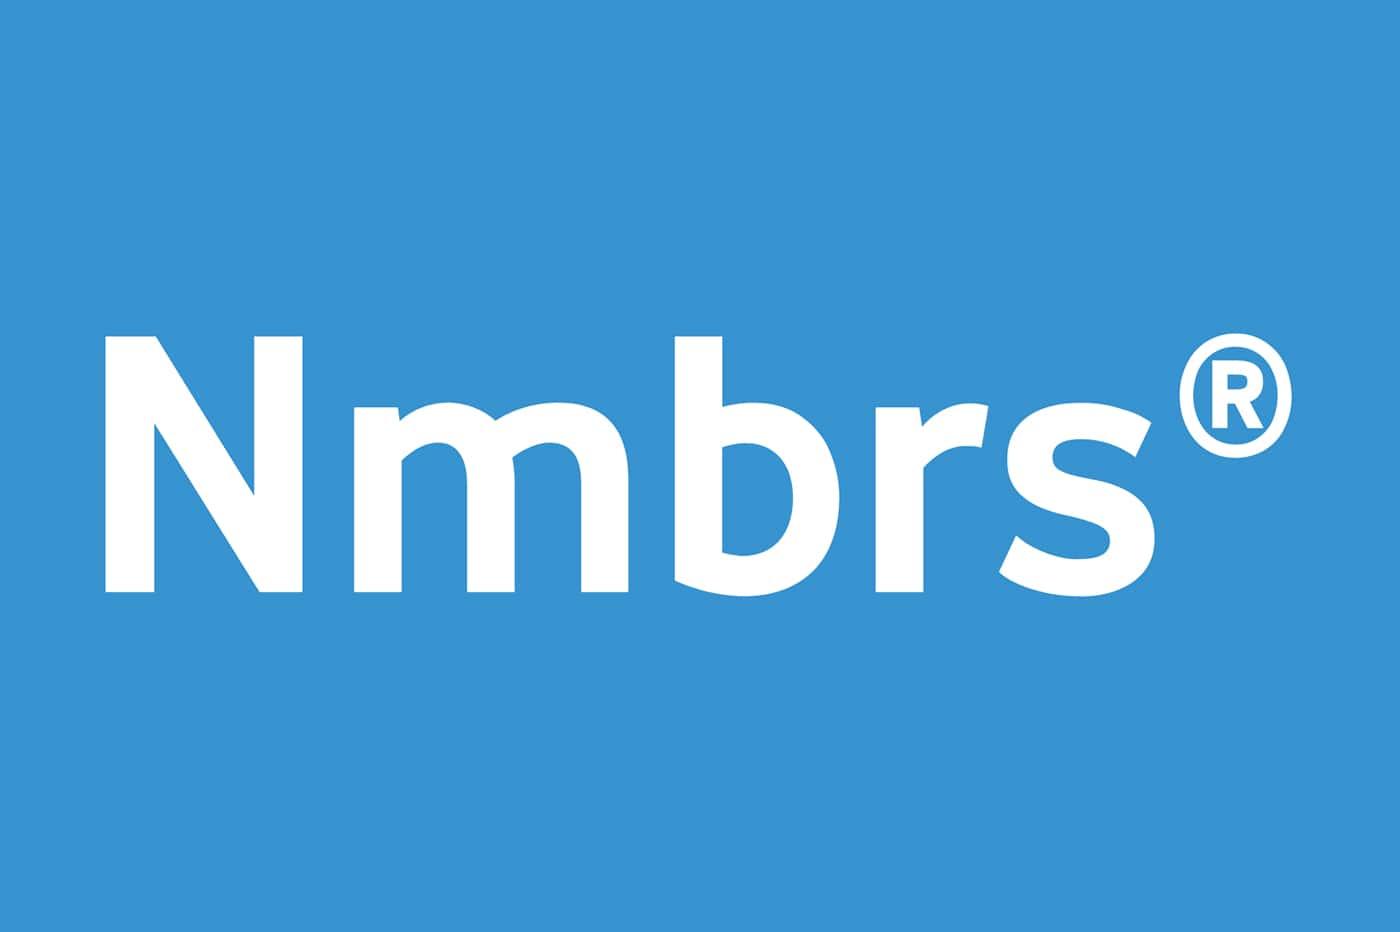 visma nmbrs® expert training